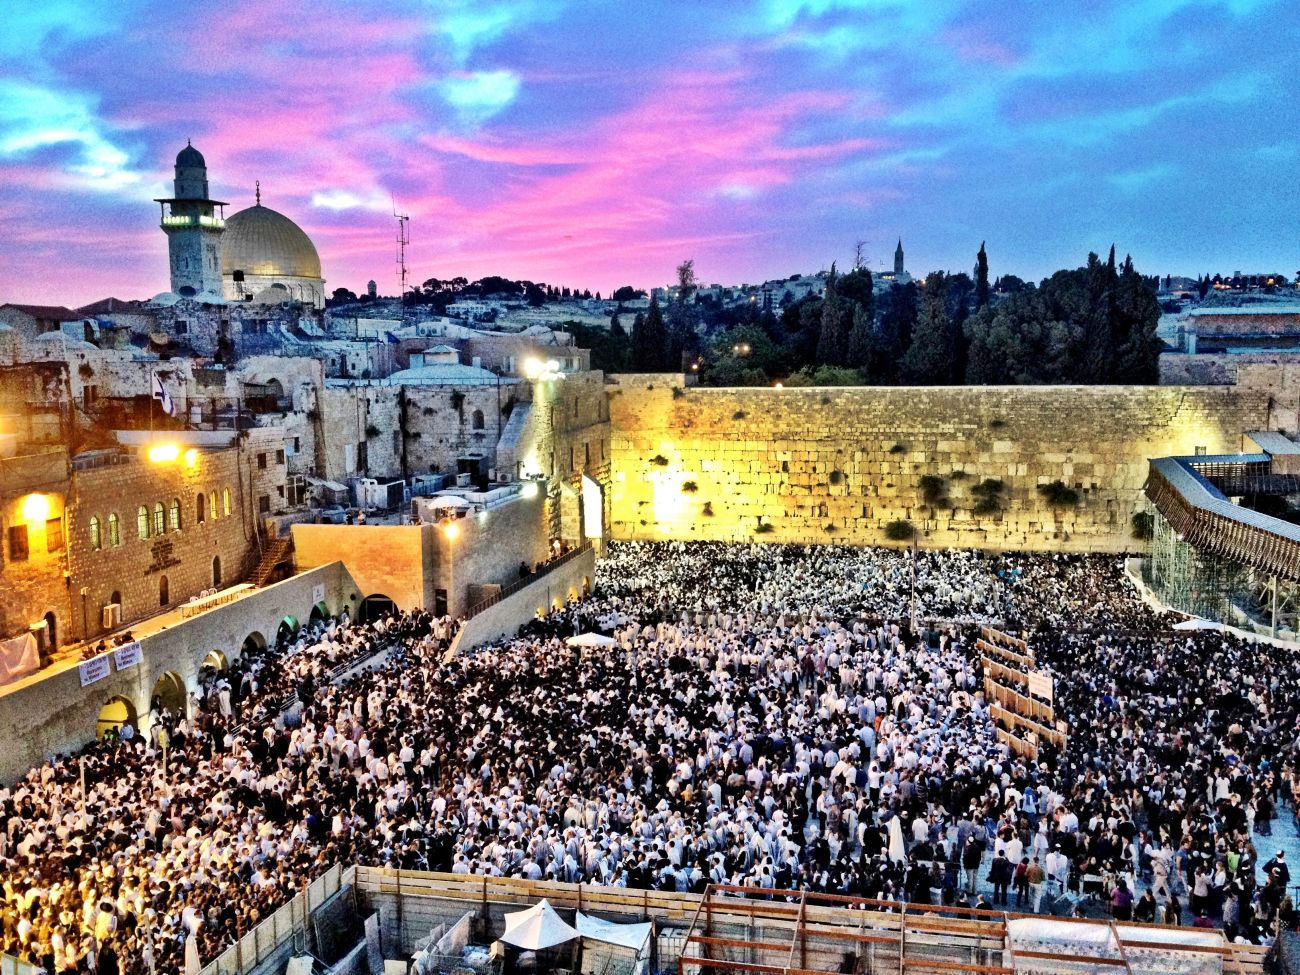 Western Wall, Jerusalem on Shavuot, May 26, 2012.